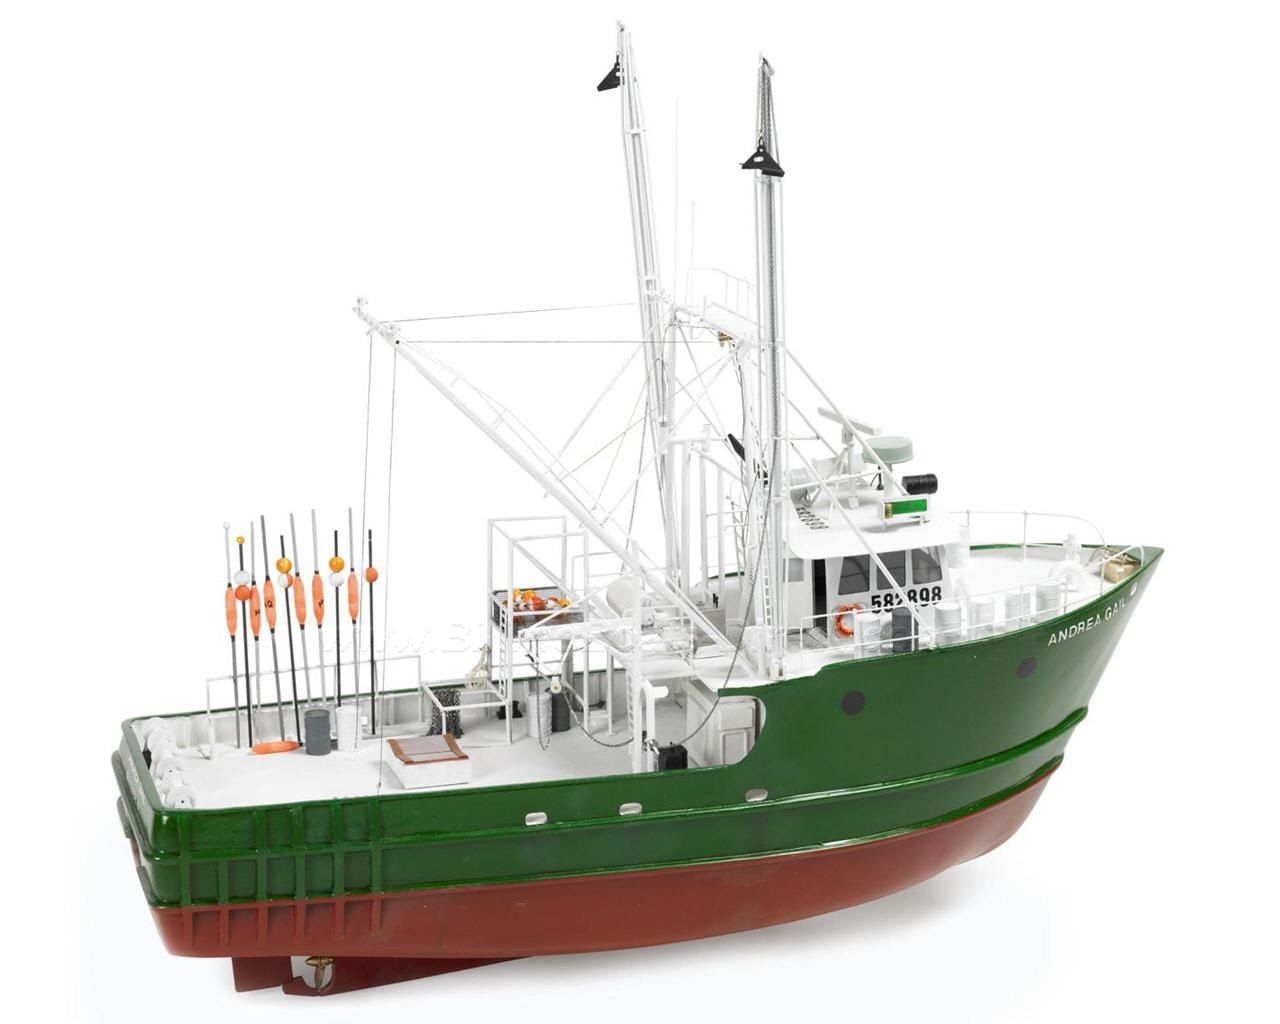 Billing boats b726 andrea gail fishing boat wood hull for Model fishing boats